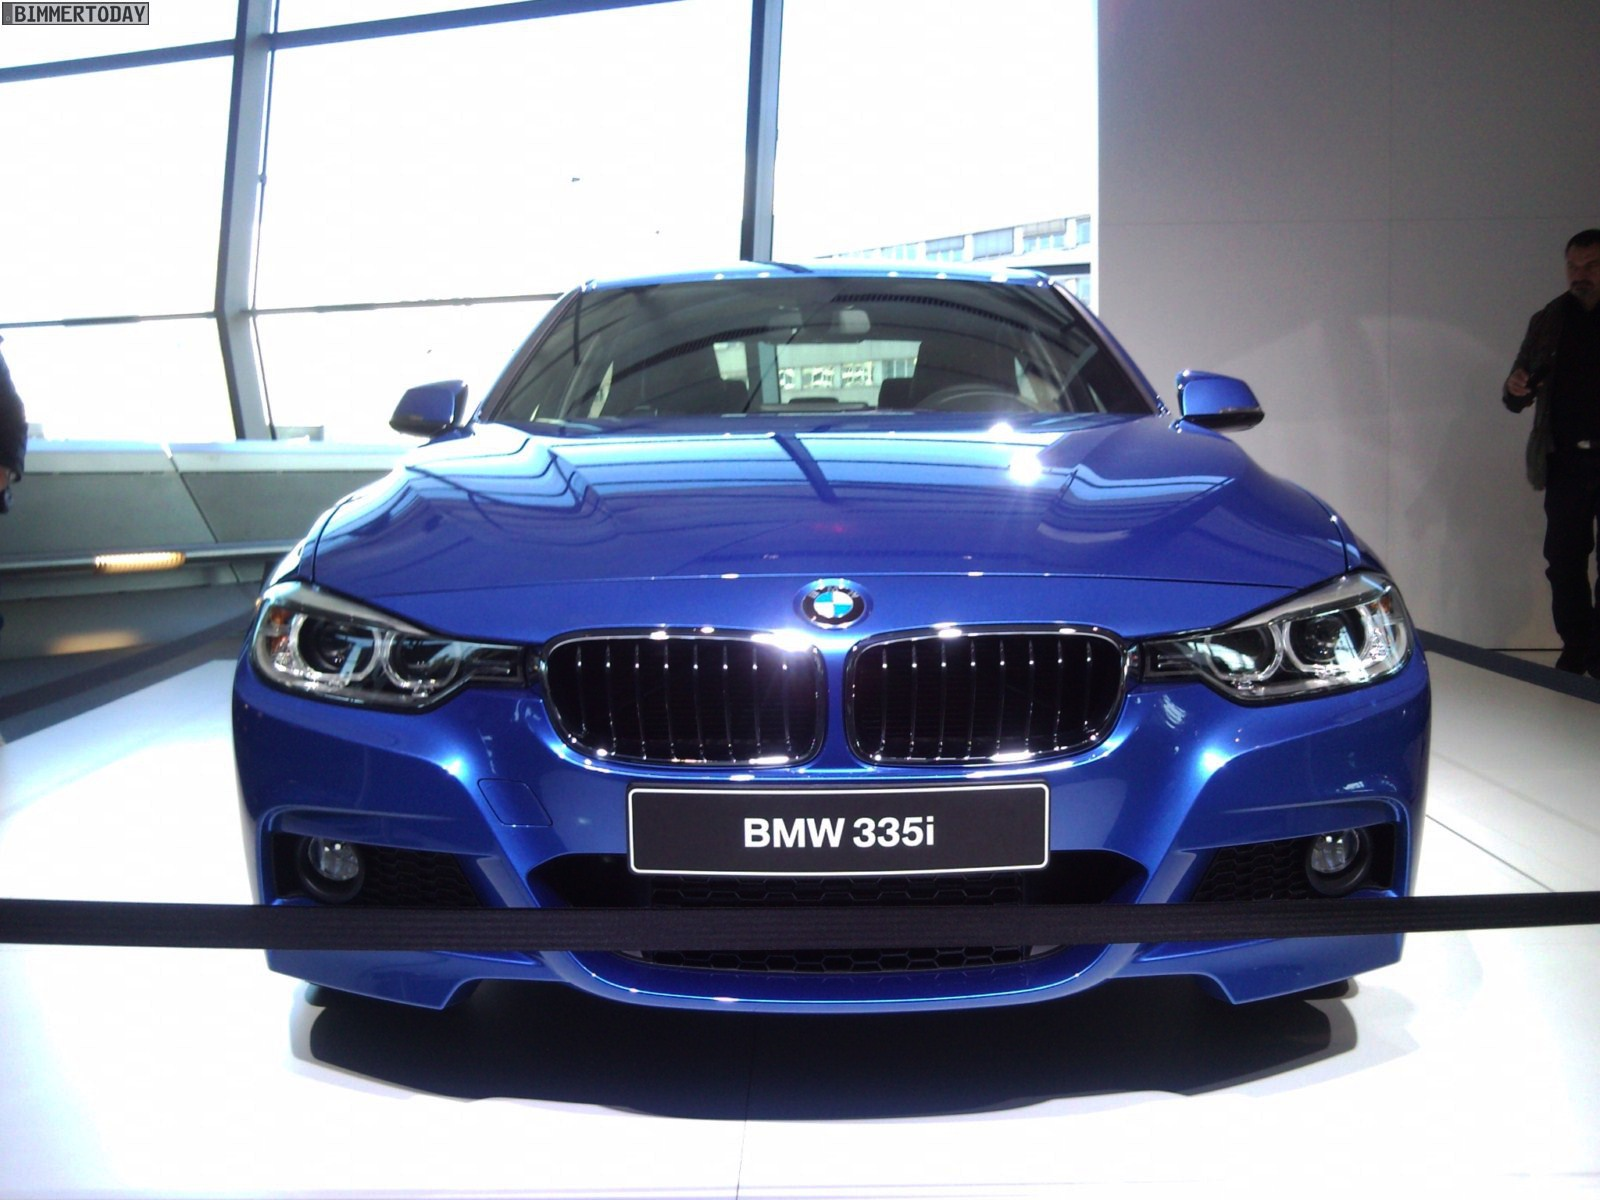 Real Life Photos: 2012 BMW 3 Series M Sport